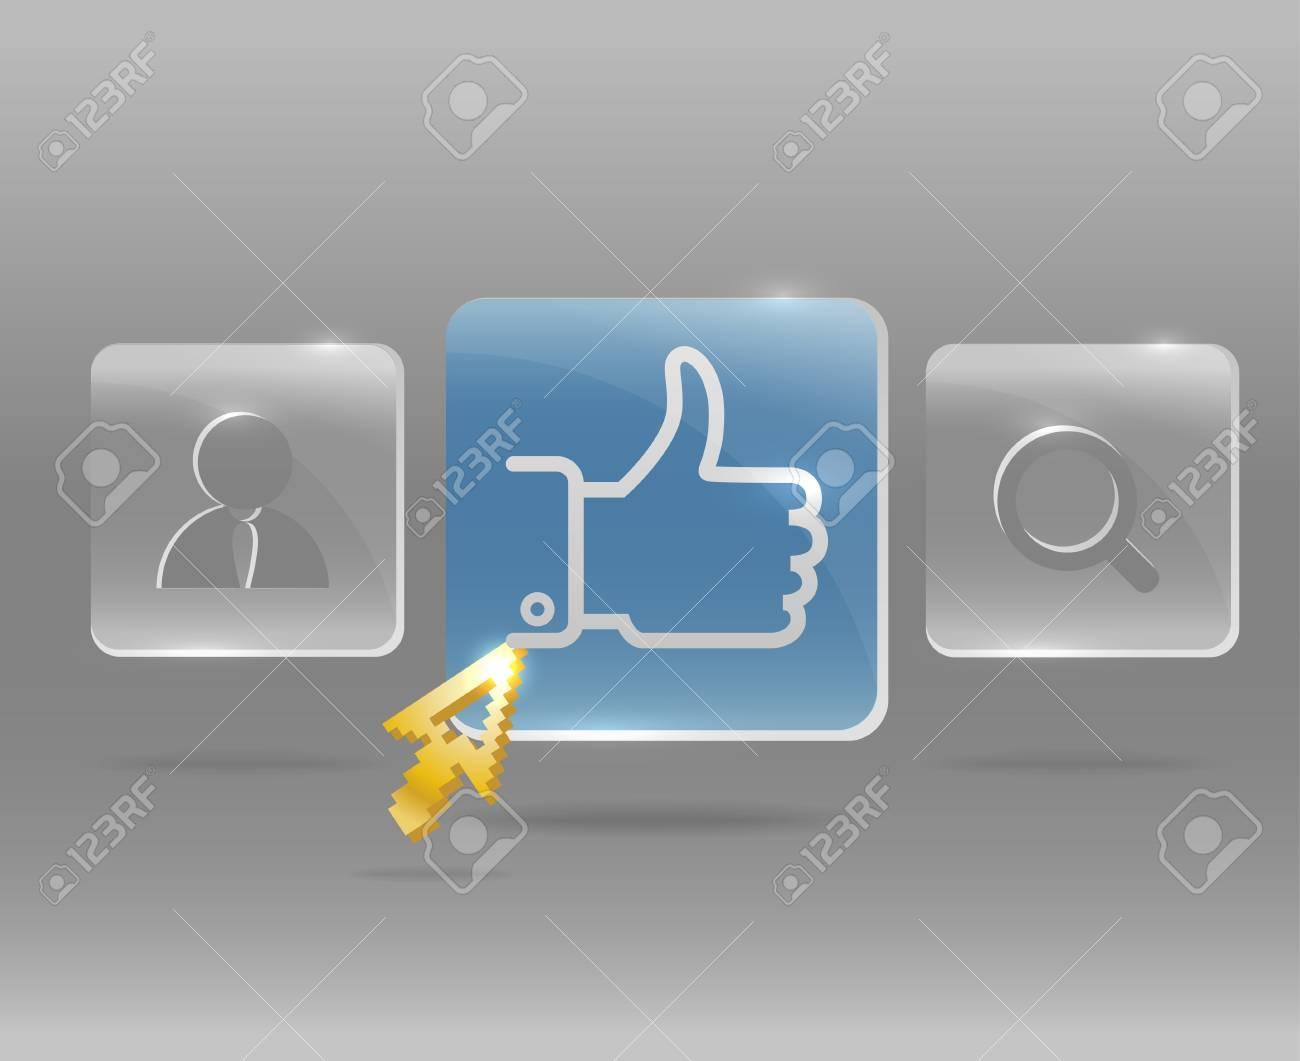 Modern social media menu with glass buttons and golden arrow Stock Vector - 13506899